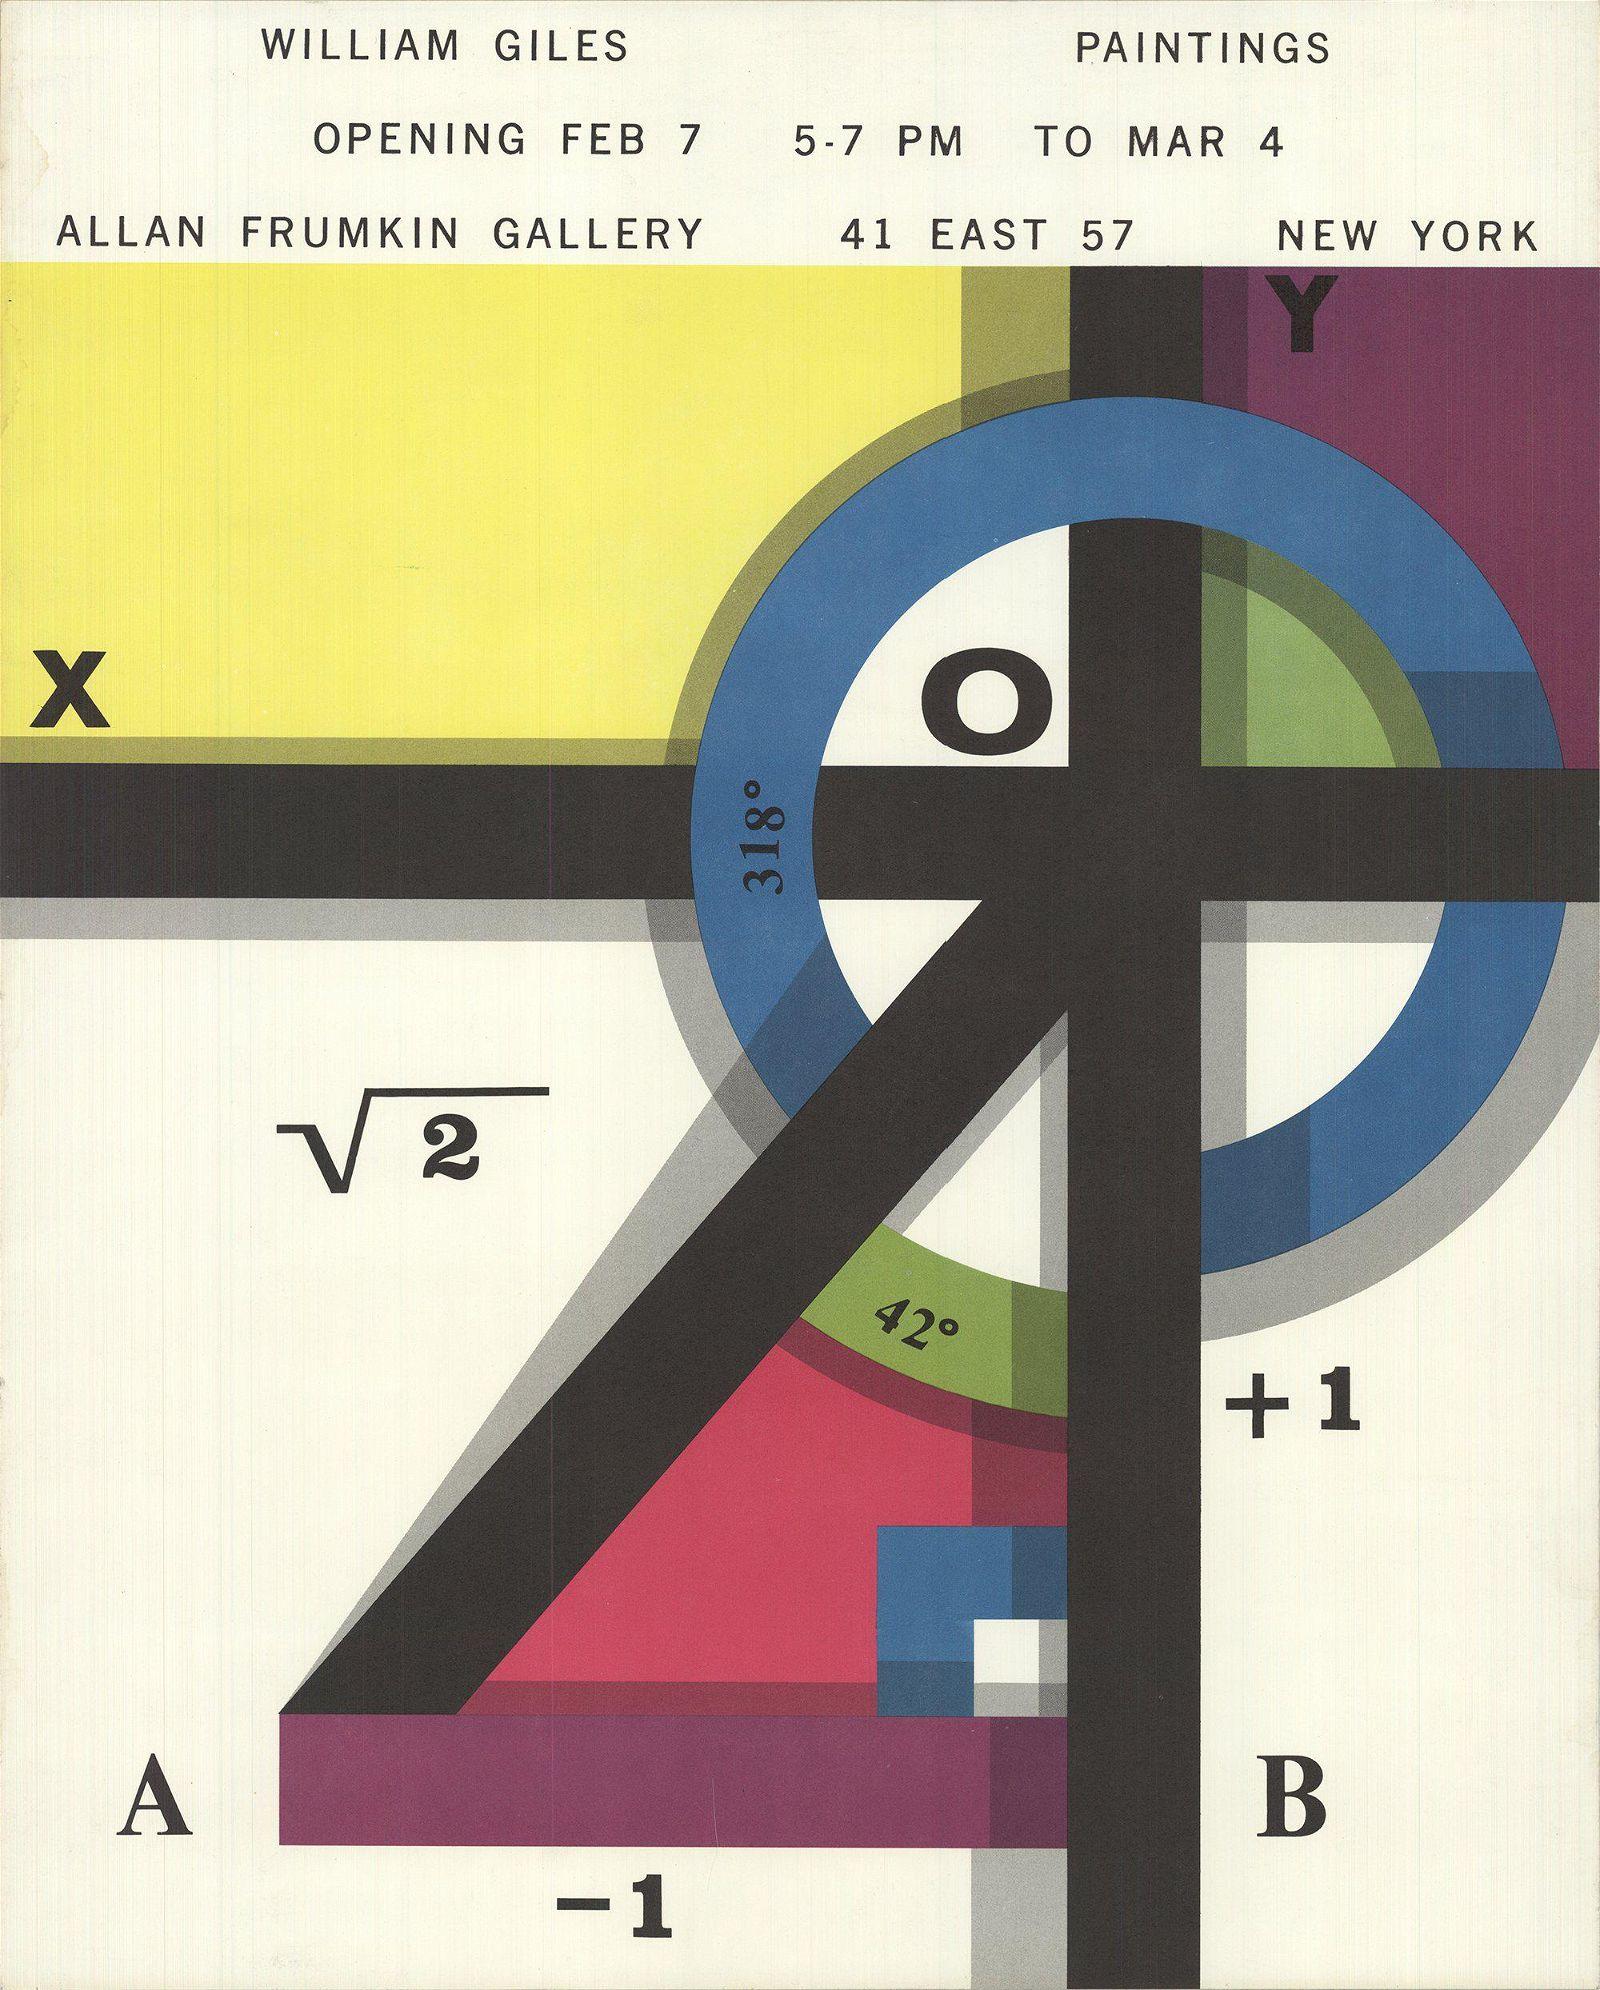 William Giles: Paintings